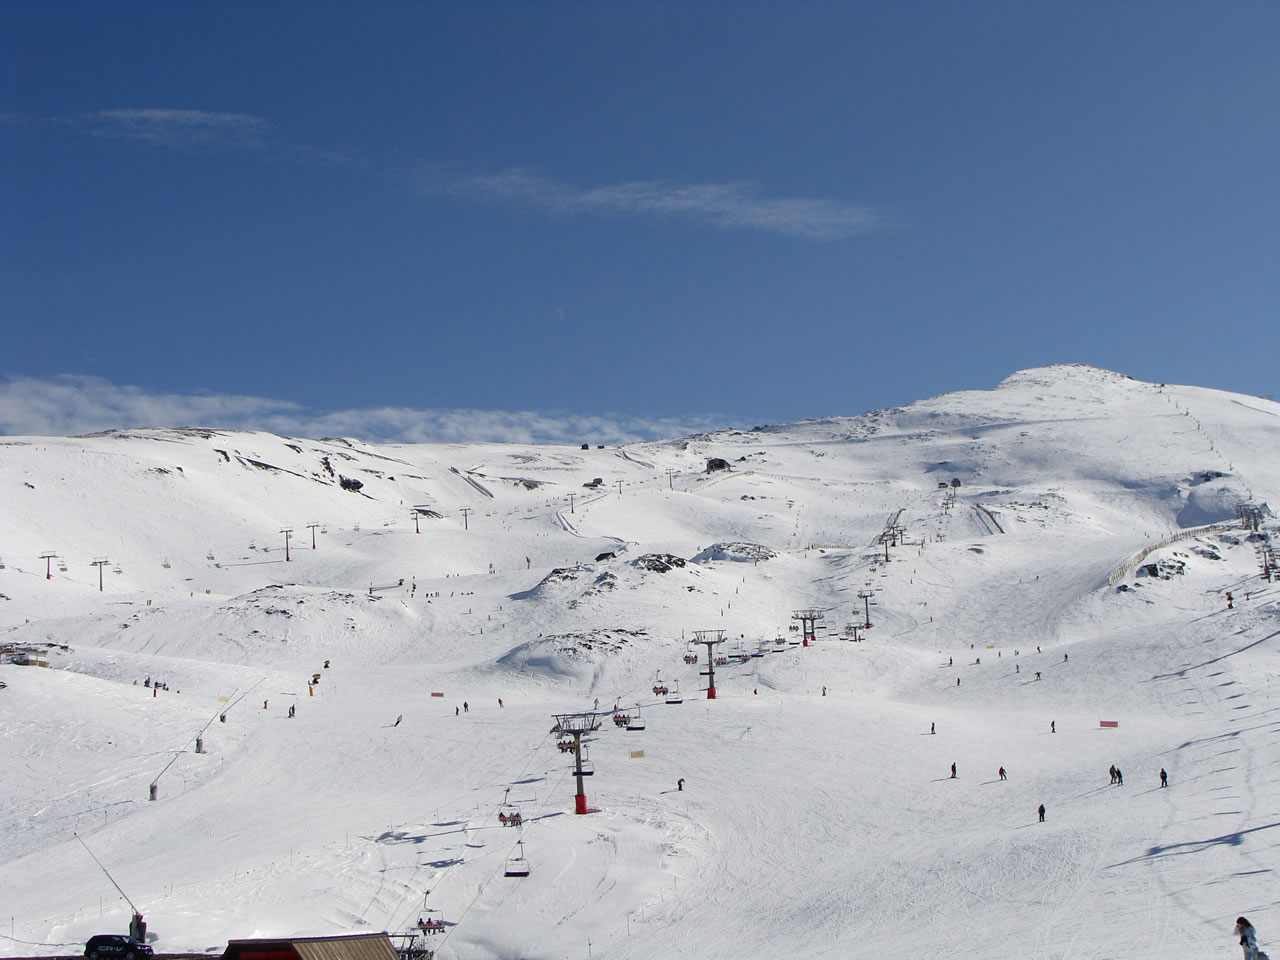 video: snowing in the sierra nevada spain today - snowbrains